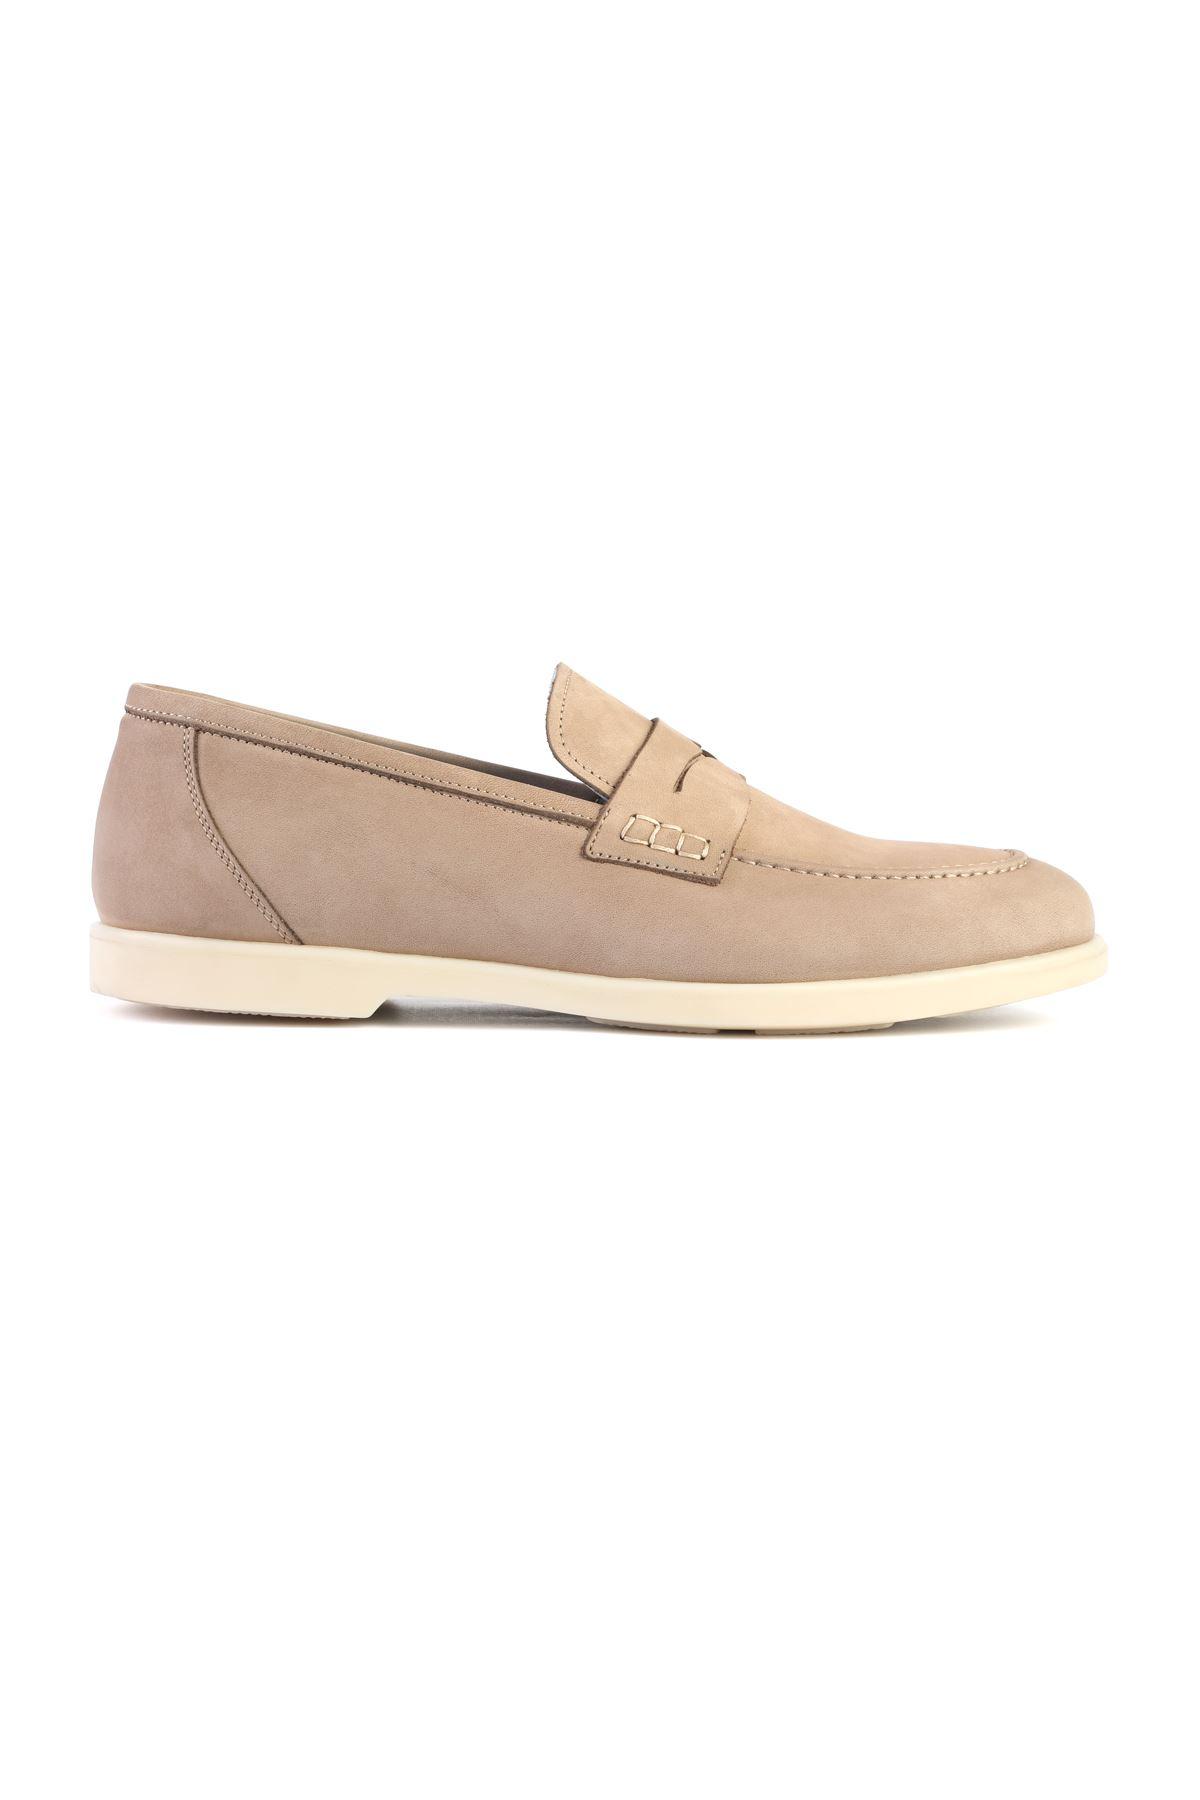 Libero 3216 Mink Loafer Shoes